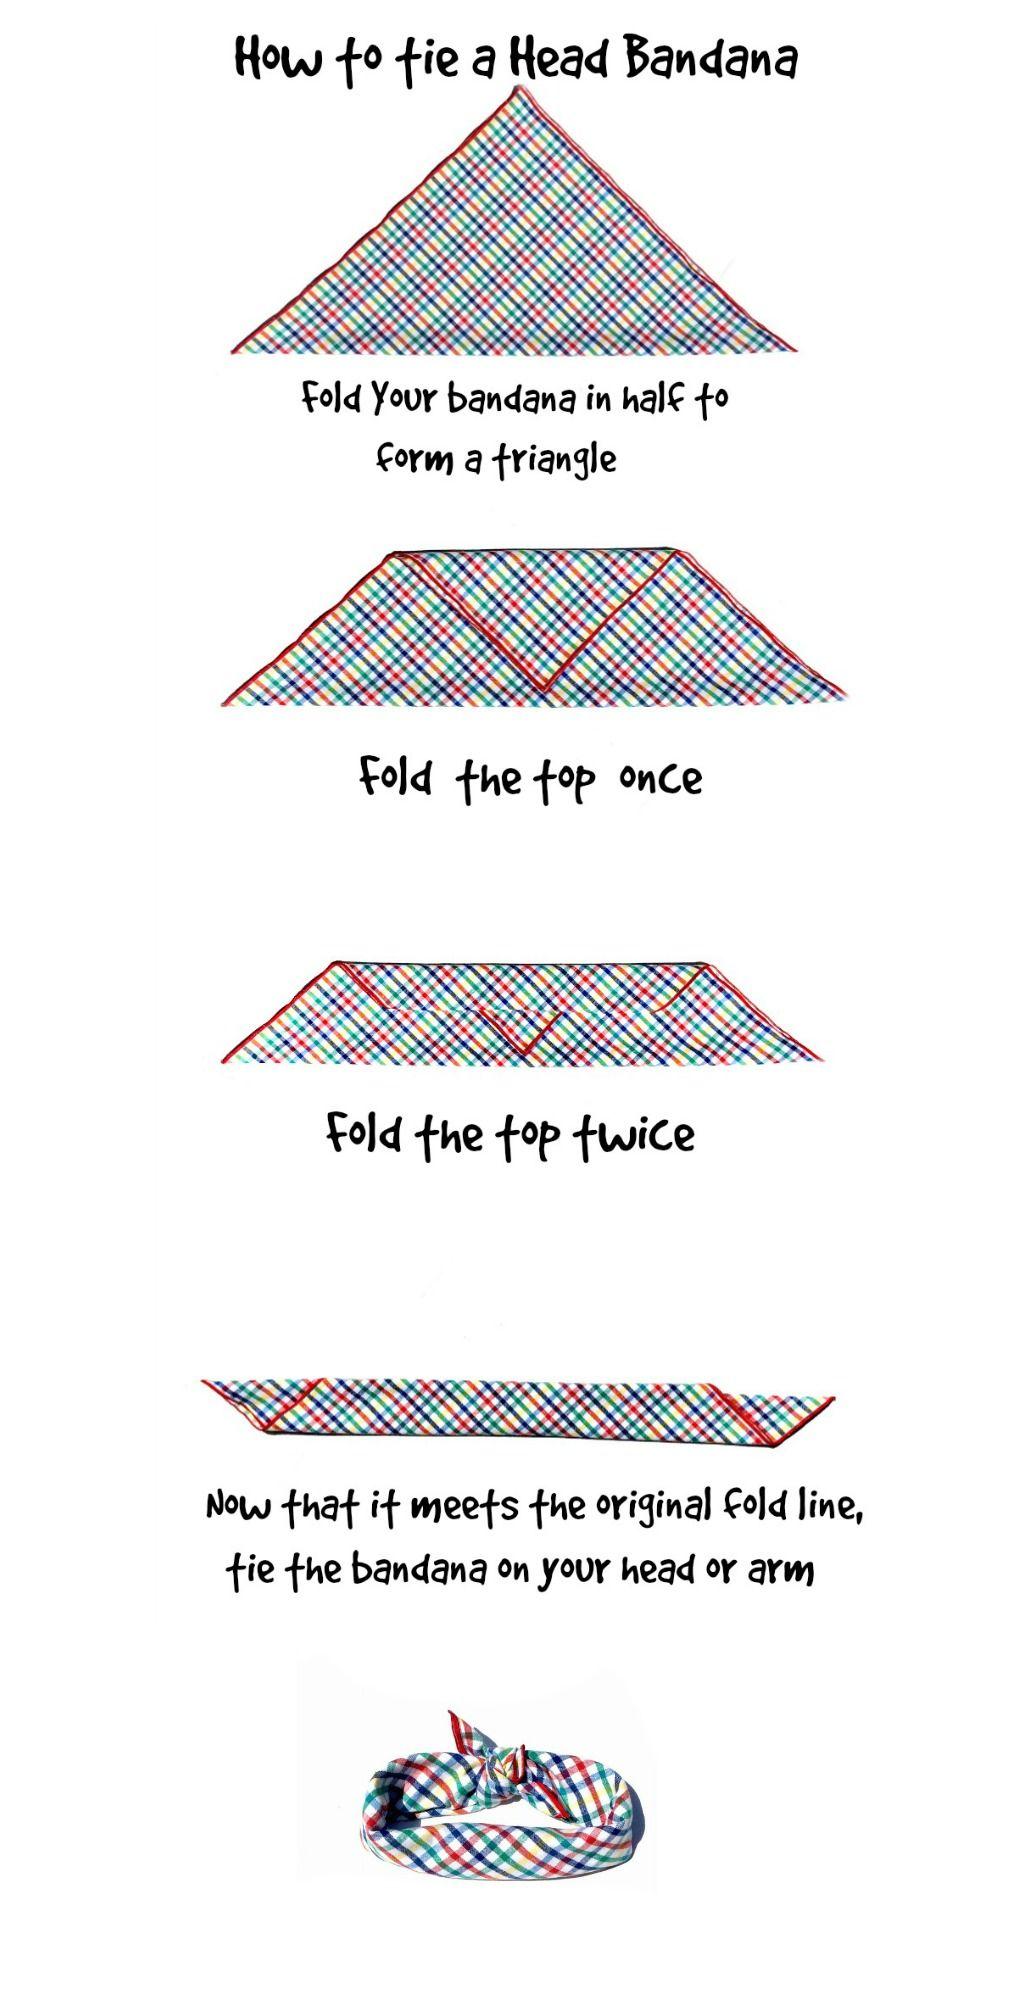 How to tie a head or arm bandana how to tie bandana